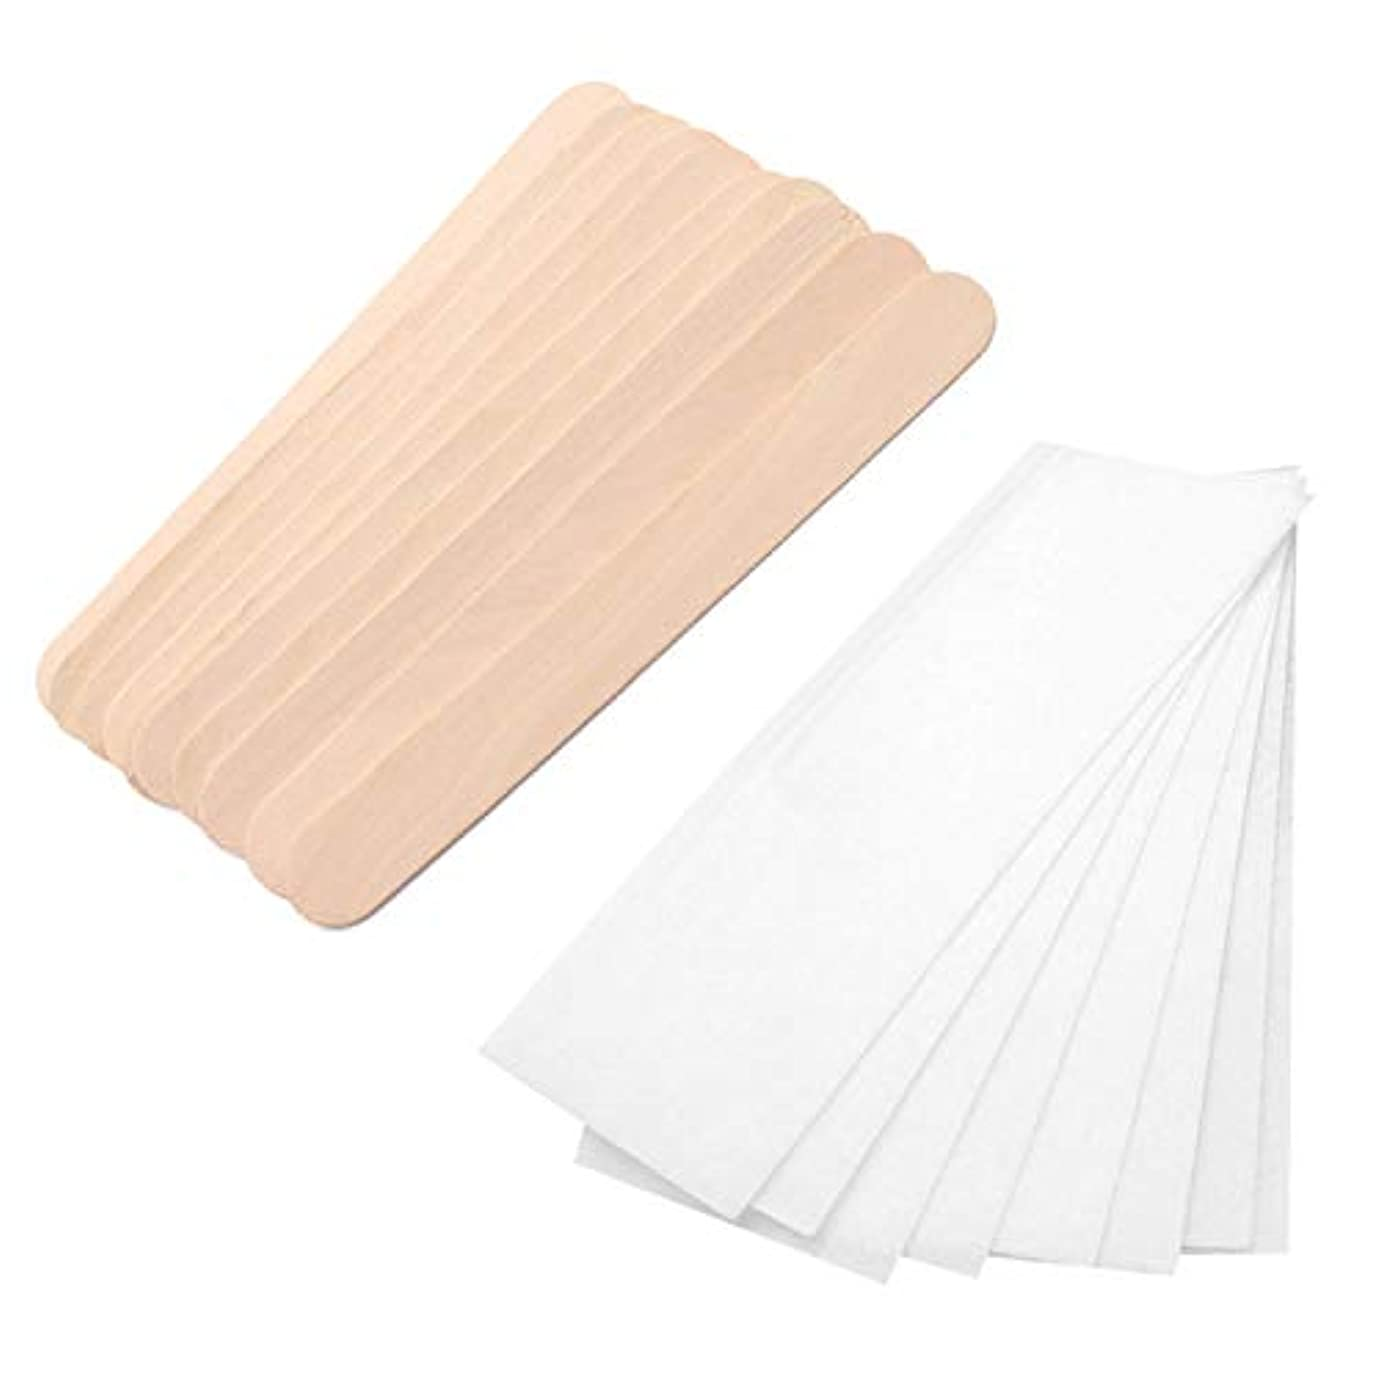 Migavann 100個木製ワックススティック 使い捨て木製ワックススティックへらアプリケーター 100個不織ワックスストリップ脱毛紙